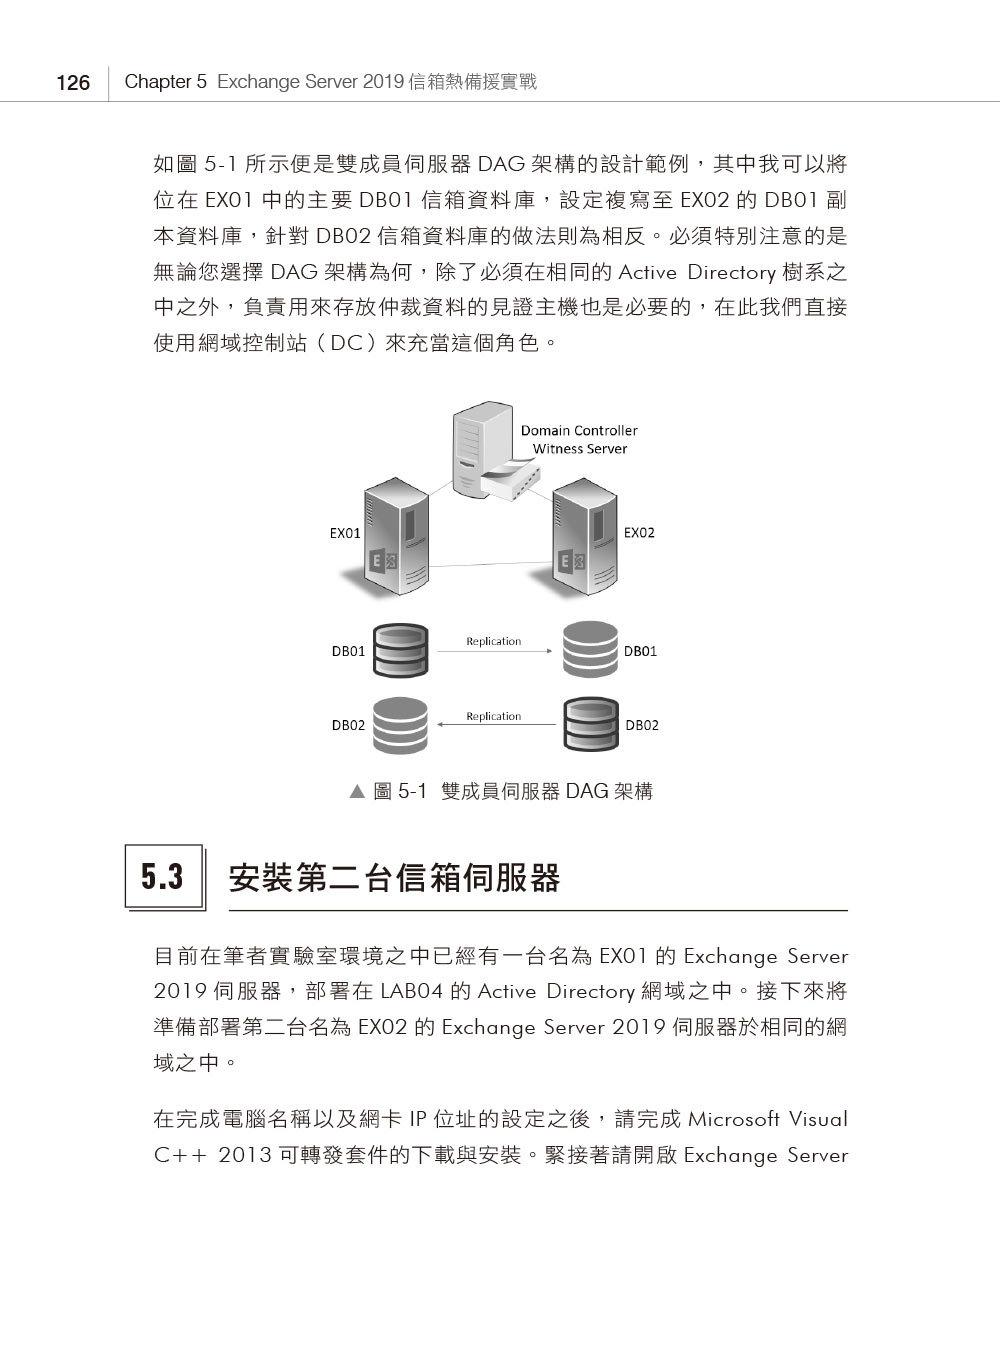 Exchange Server 2019 工作現場實戰寶典|基礎建置x進階管理x資訊安全管理-preview-7